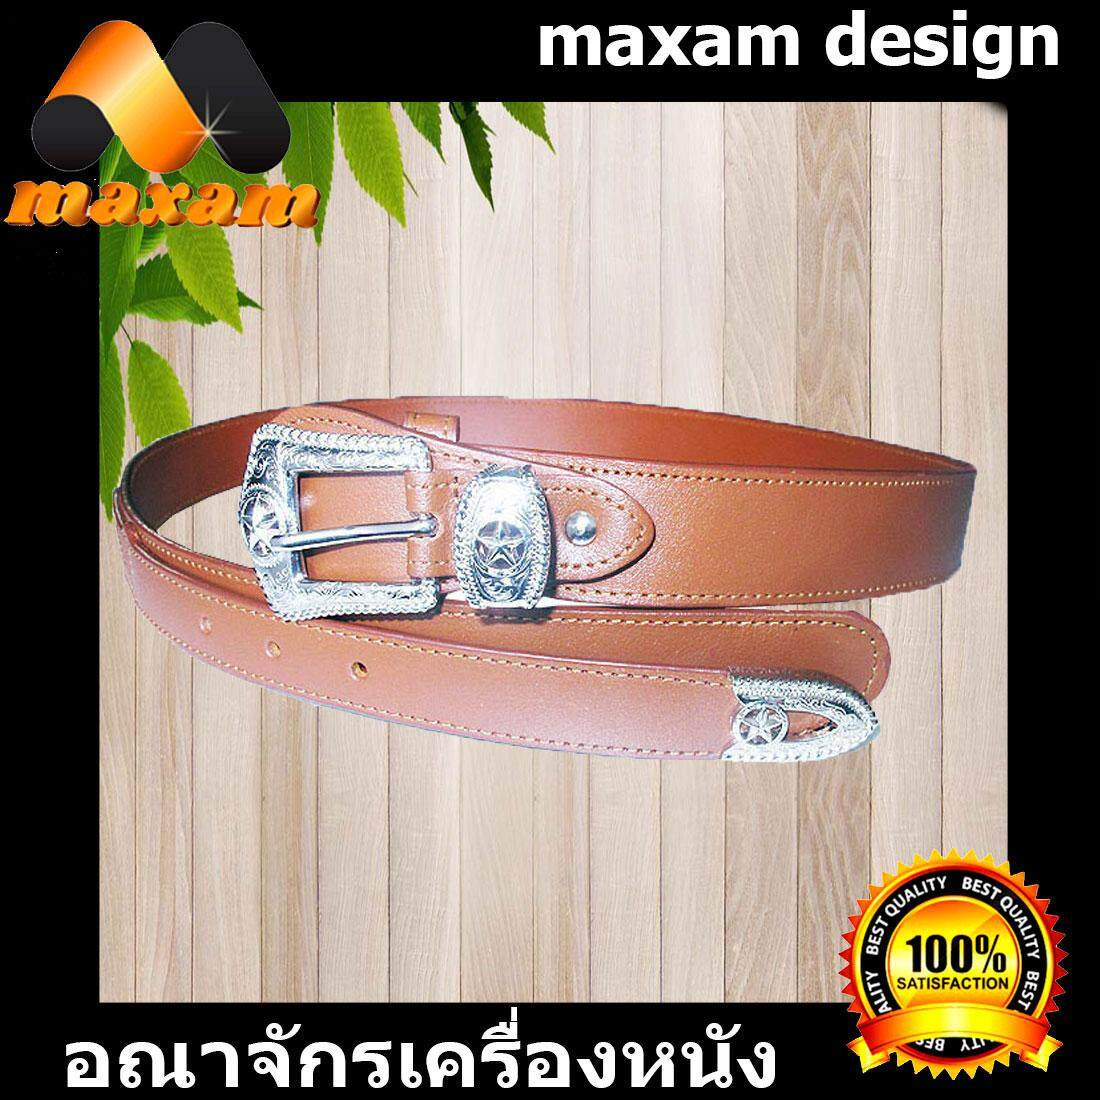 maxam design  เข็มขัดหนังสี แทน หัวดาว เทศกาลของขวัญ สำหรับตัวคุณเอง หรือ คุณพ่อ เพื่อนฝูงมิตรสหาย Style Cowboy เป็นหนังวัวแท้ยาวตลอดเส้น 48นิ้ว หัวดาว เหมาะสำหรับผู้ที่มีเอว37-42นิ้ว     maxam design